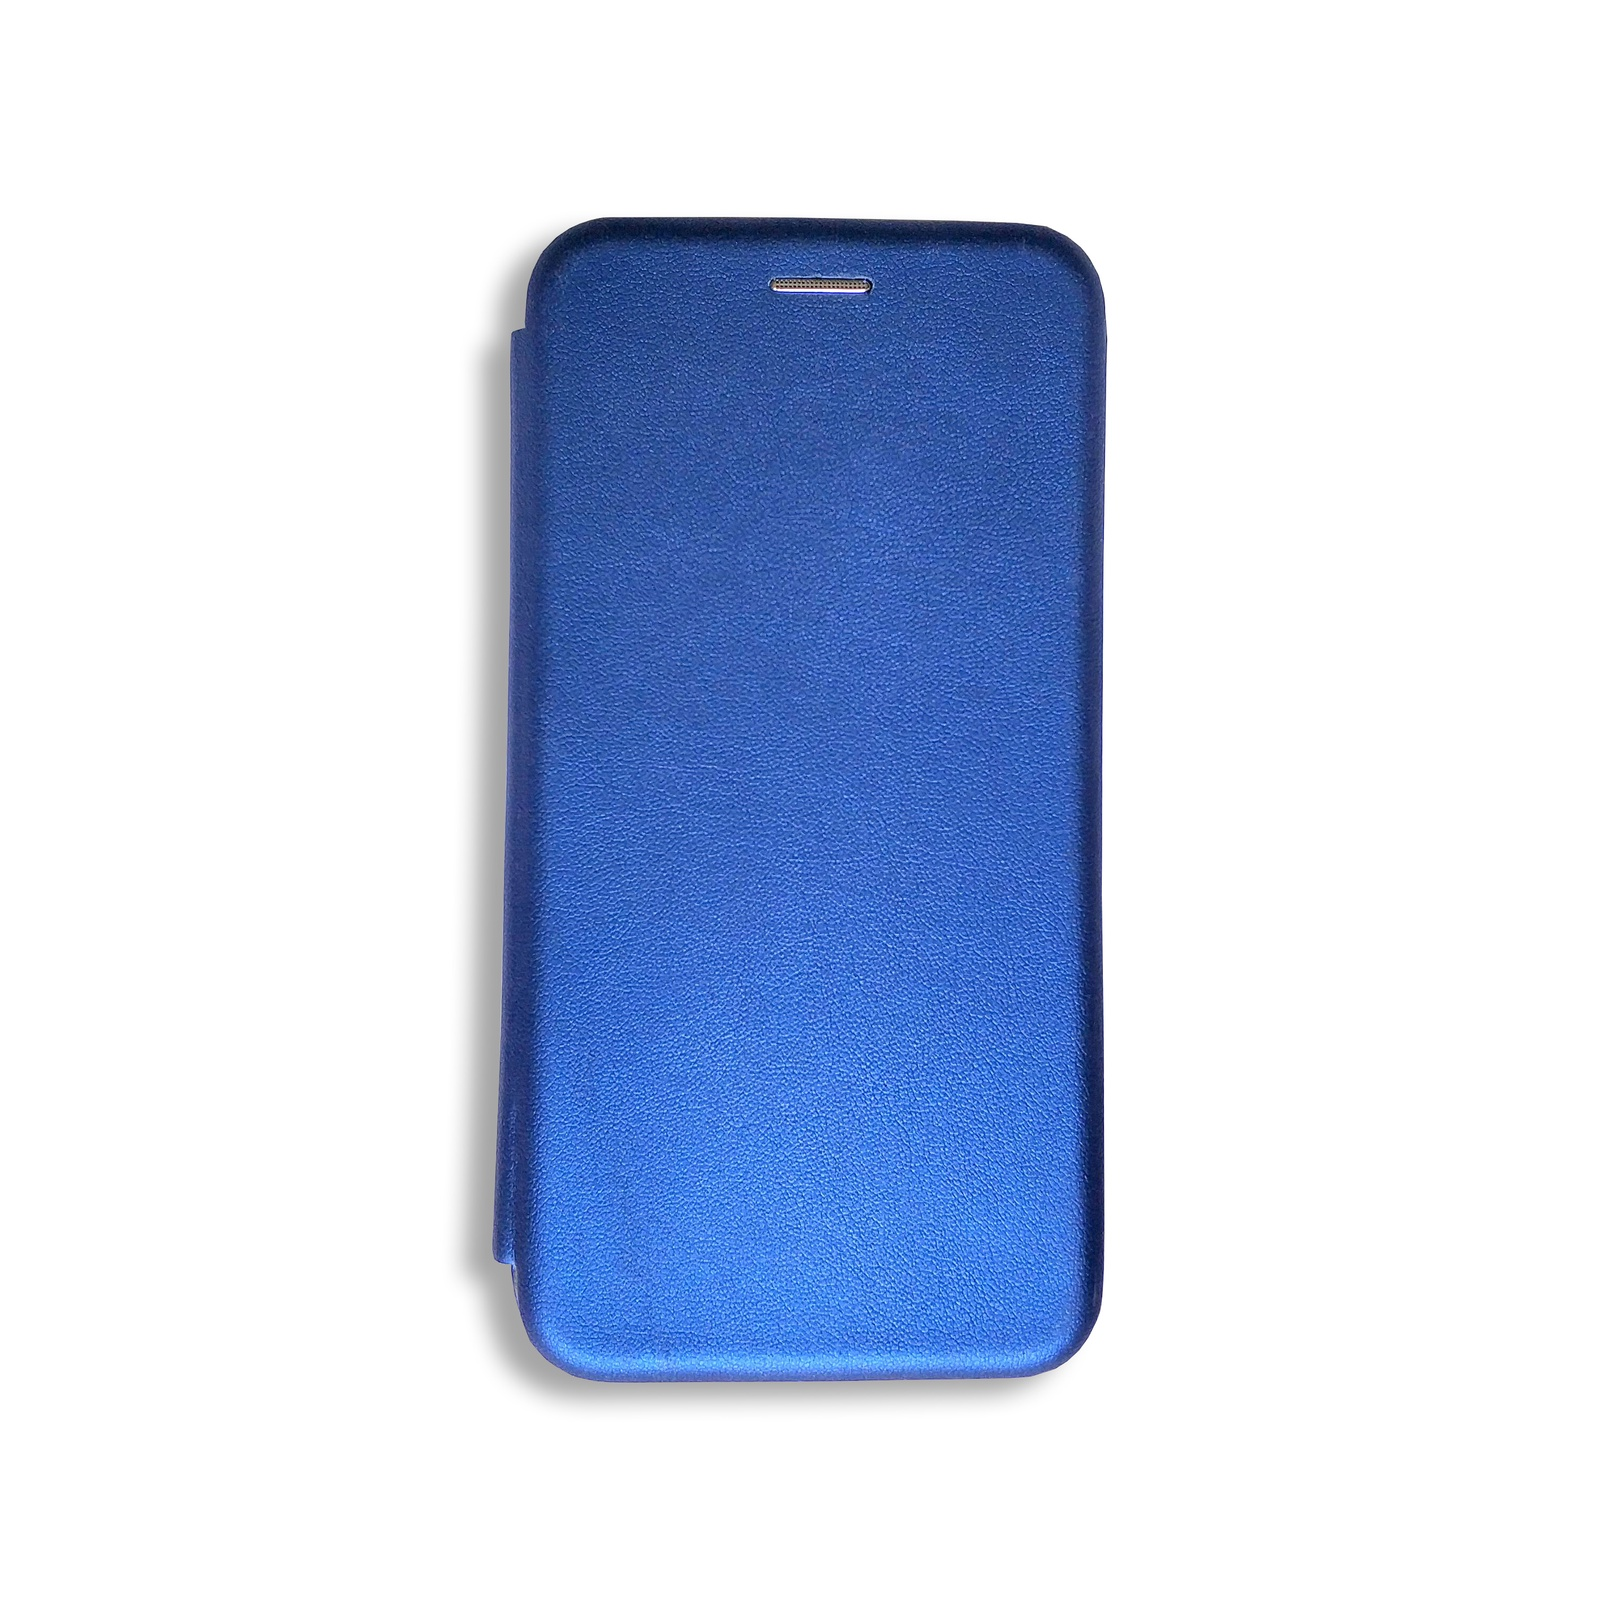 Чехол для сотового телефона книжка для Samsung Galaxy S10+, синий